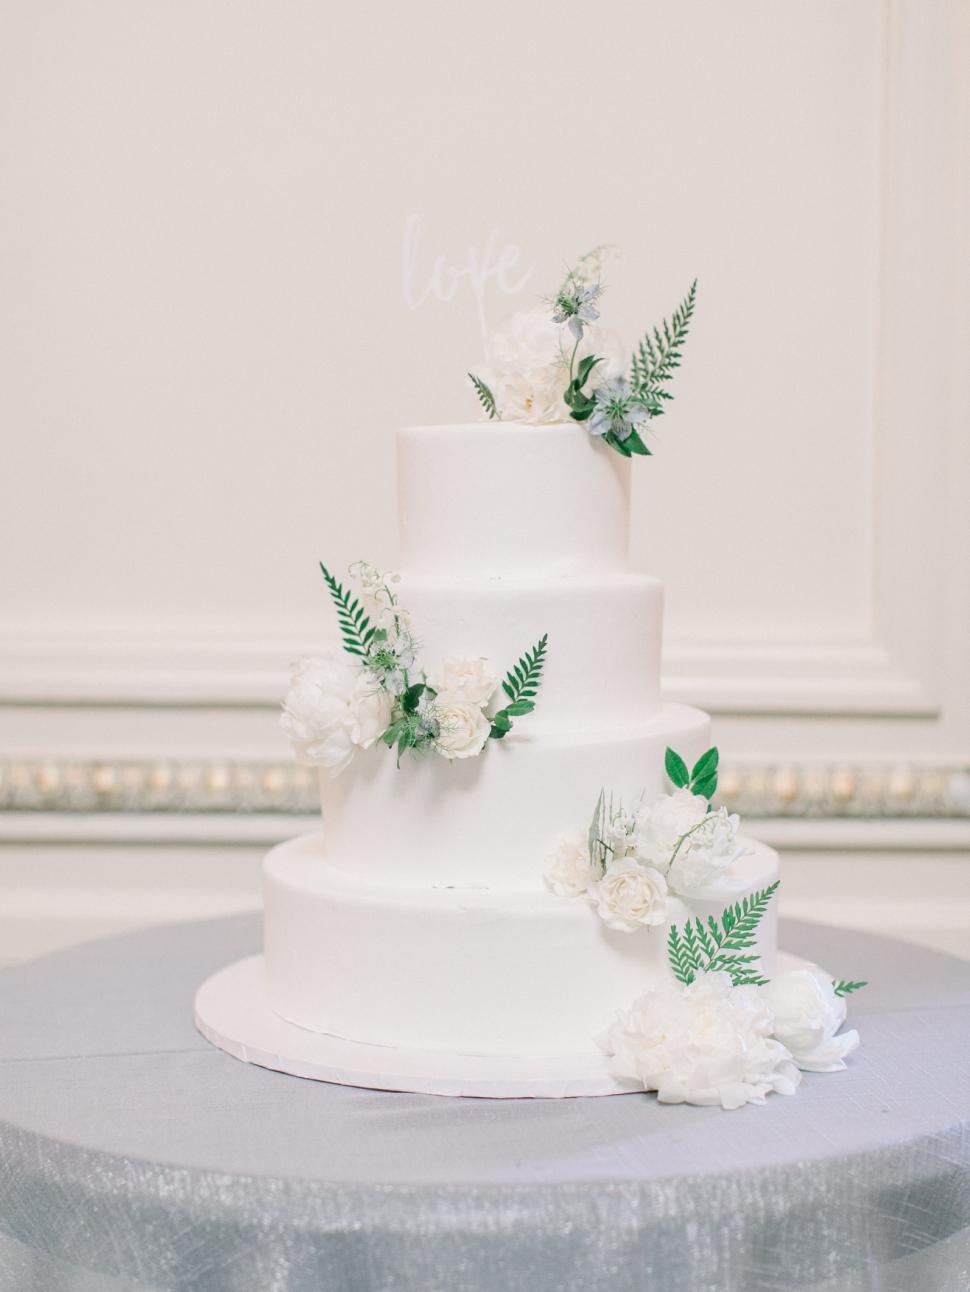 Bourne-Mansion-Wedding-Photos-Cassi-Claire-Long-Island-Wedding-Photographer_40.jpg